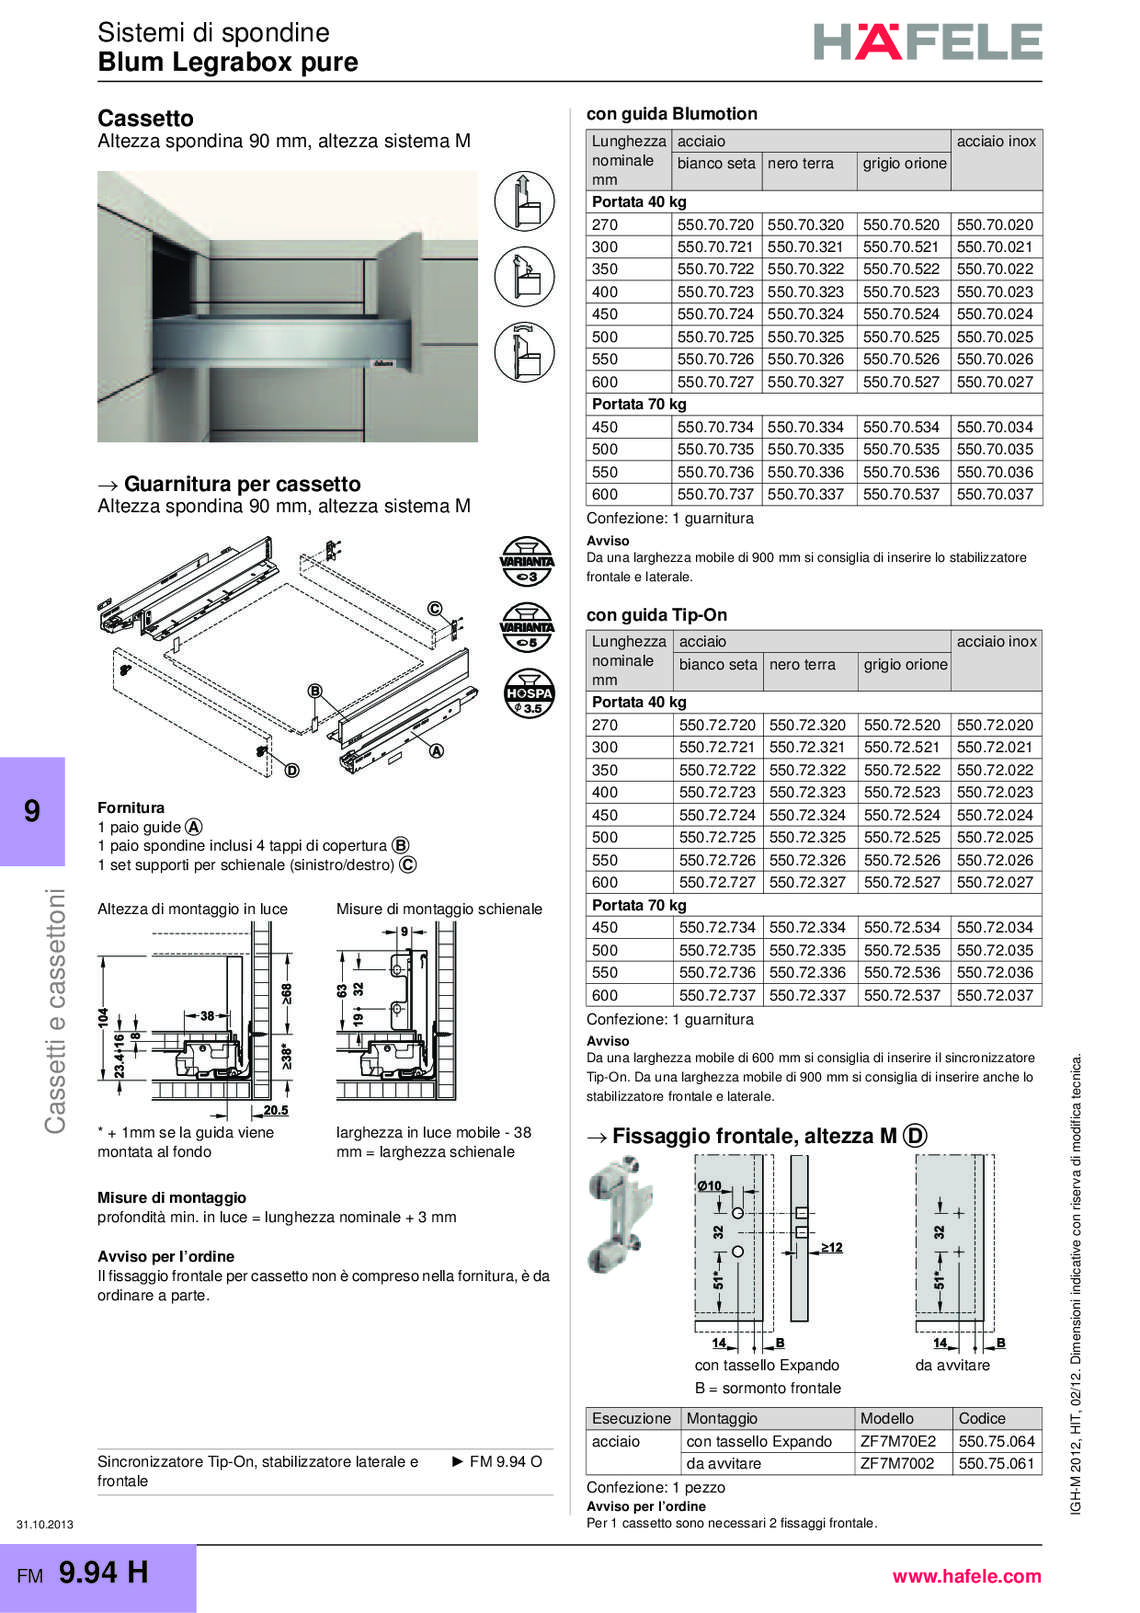 hafele-spondine-e-guide-per-mobili_40_125.jpg